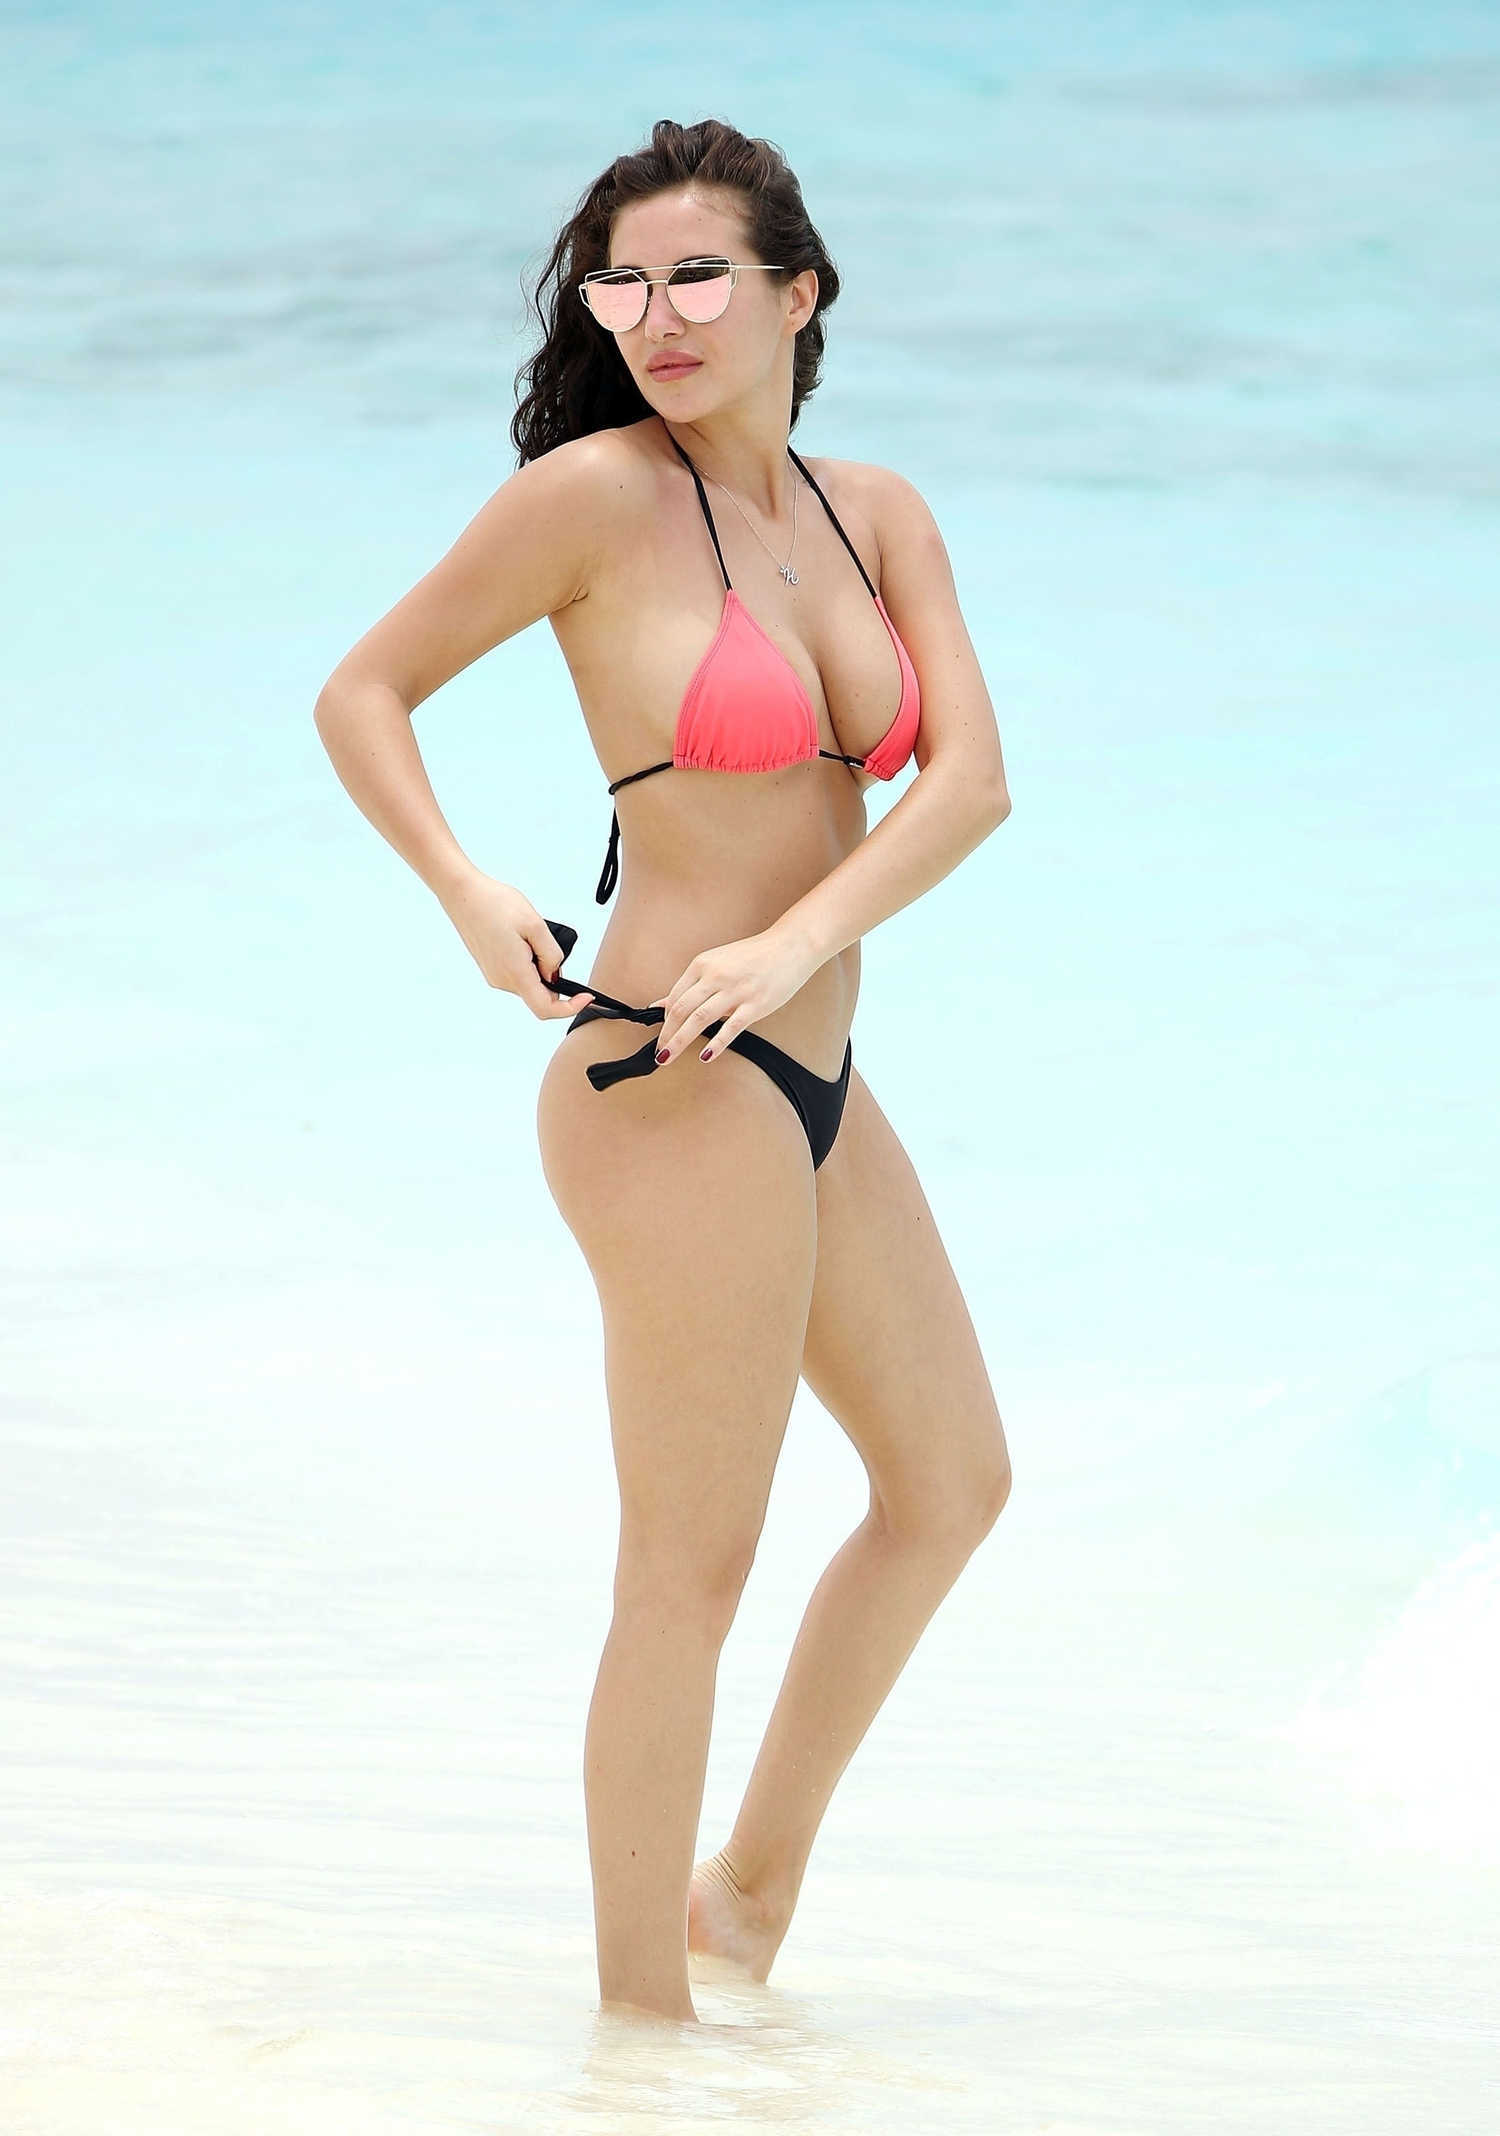 Chloe Goodman In Bikini On Beach In Dubai